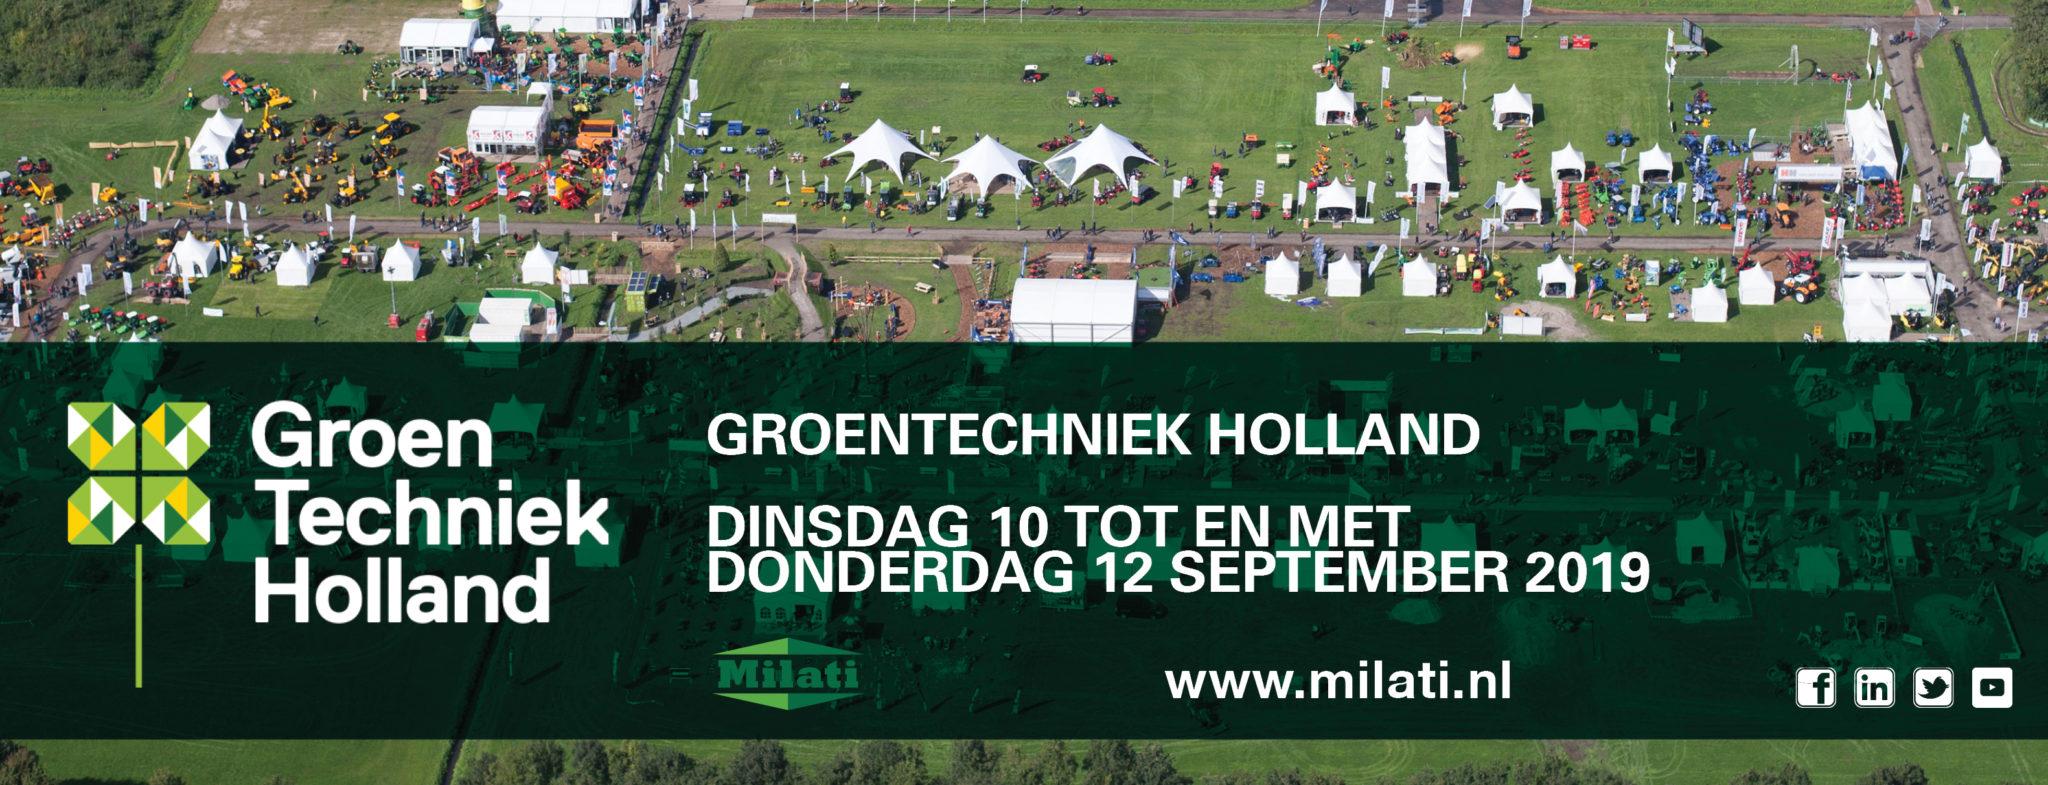 Milati - Groentechniek - Facebook